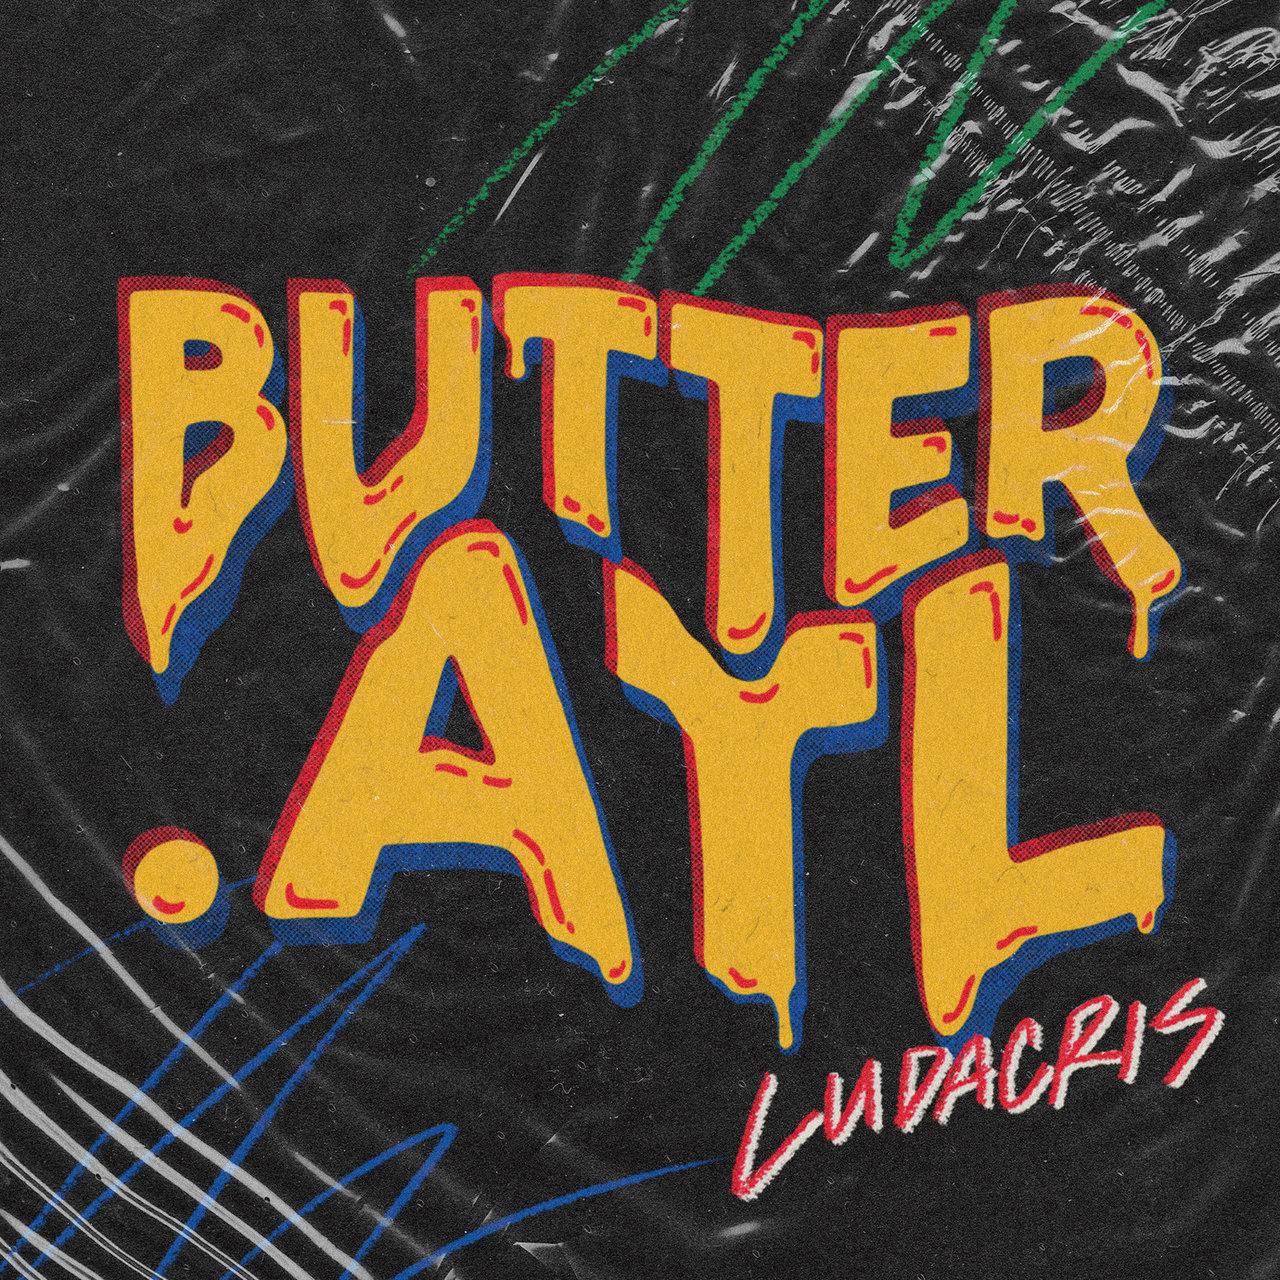 Ludacris 'Butter.Atl' Song